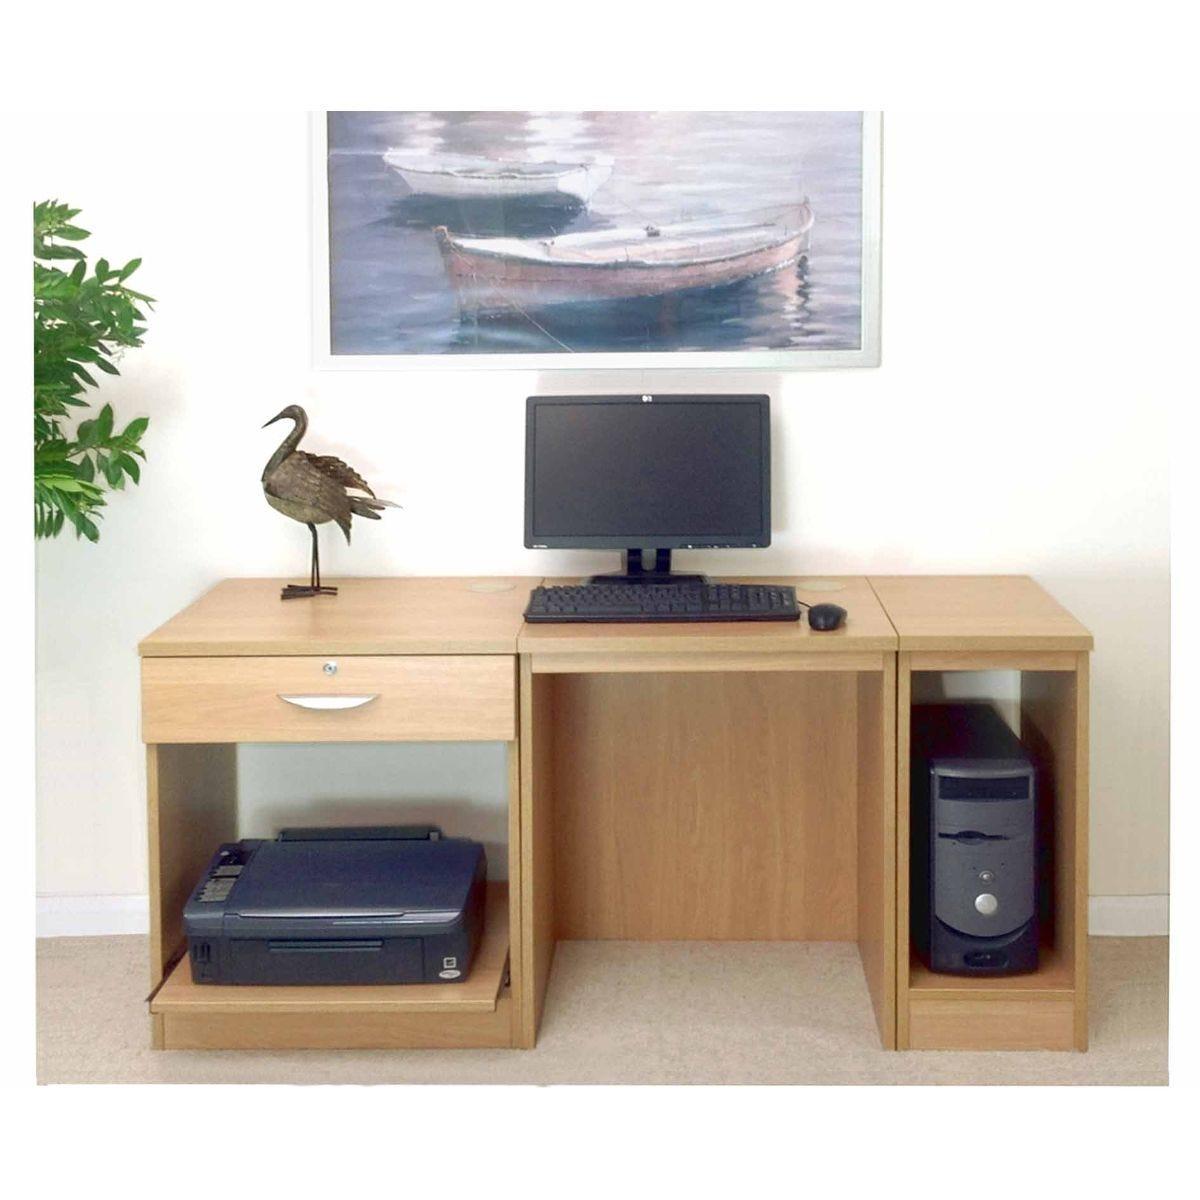 R White Home Office Furniture Desk, Classic Oak Wood Grain